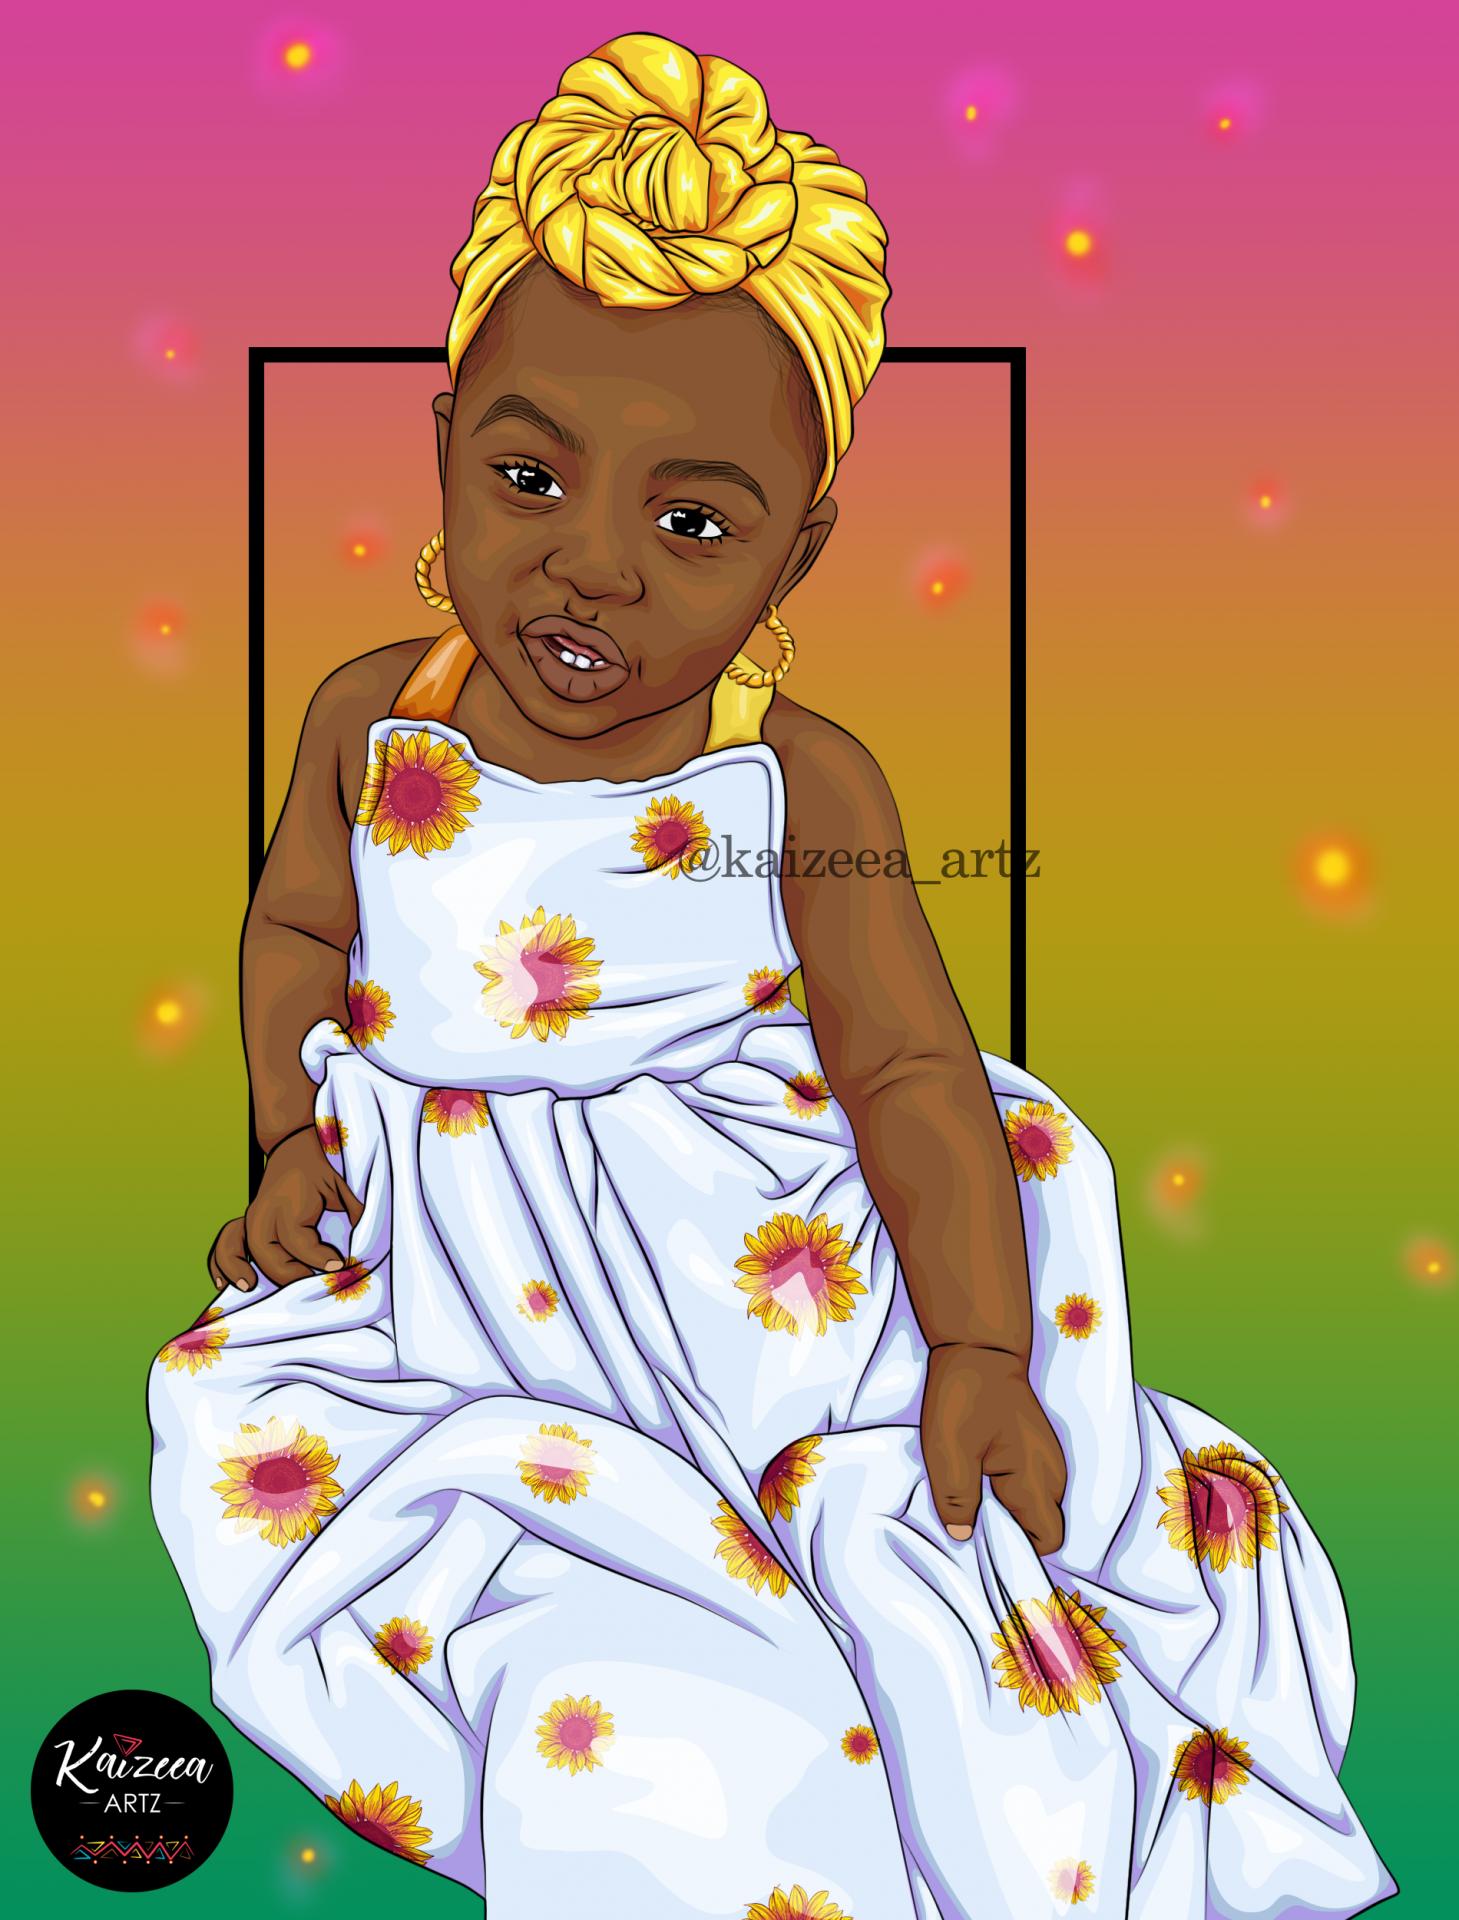 Kaizeea artz headwrap afro kids earrings dress sunflower girasol tournesol robe cutie bébé african baby conscious generation mawé tet turban heawrap styles melanin popping black girl magic mauritius africa best black art top blacl art